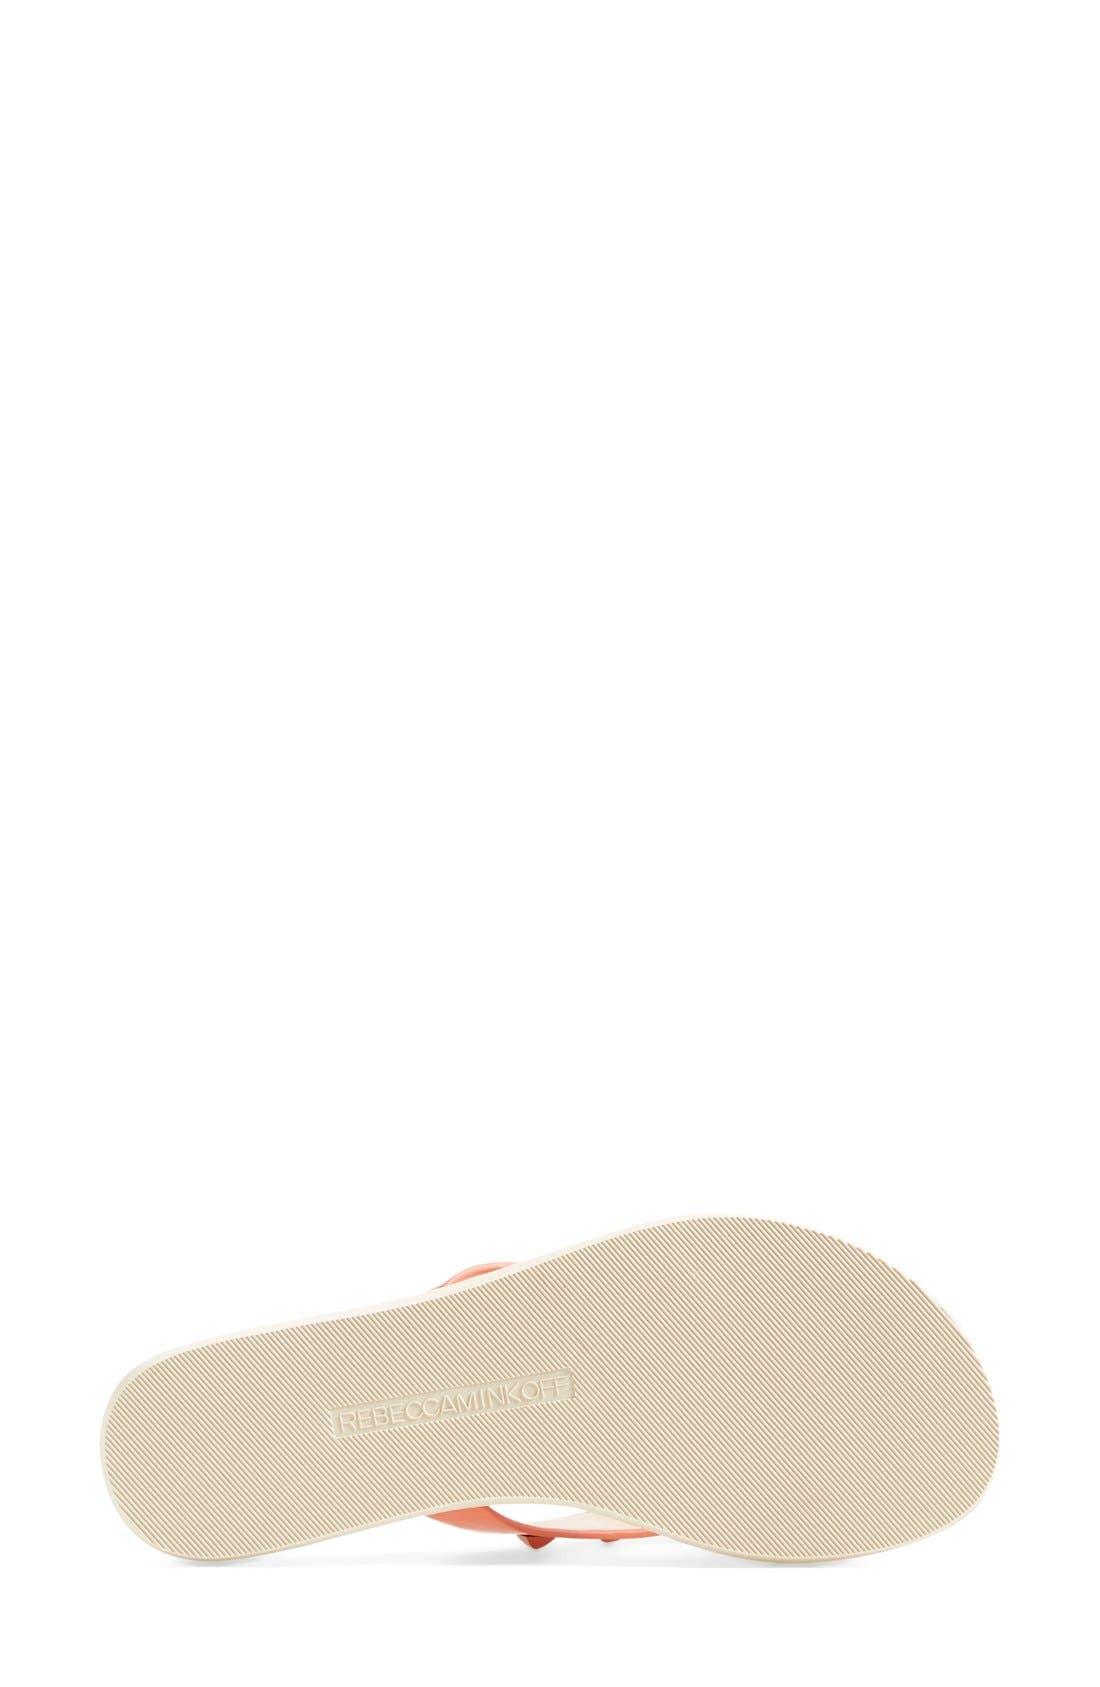 Alternate Image 4  - Rebecca Minkoff 'Fiona' Thong Sandal (Women)